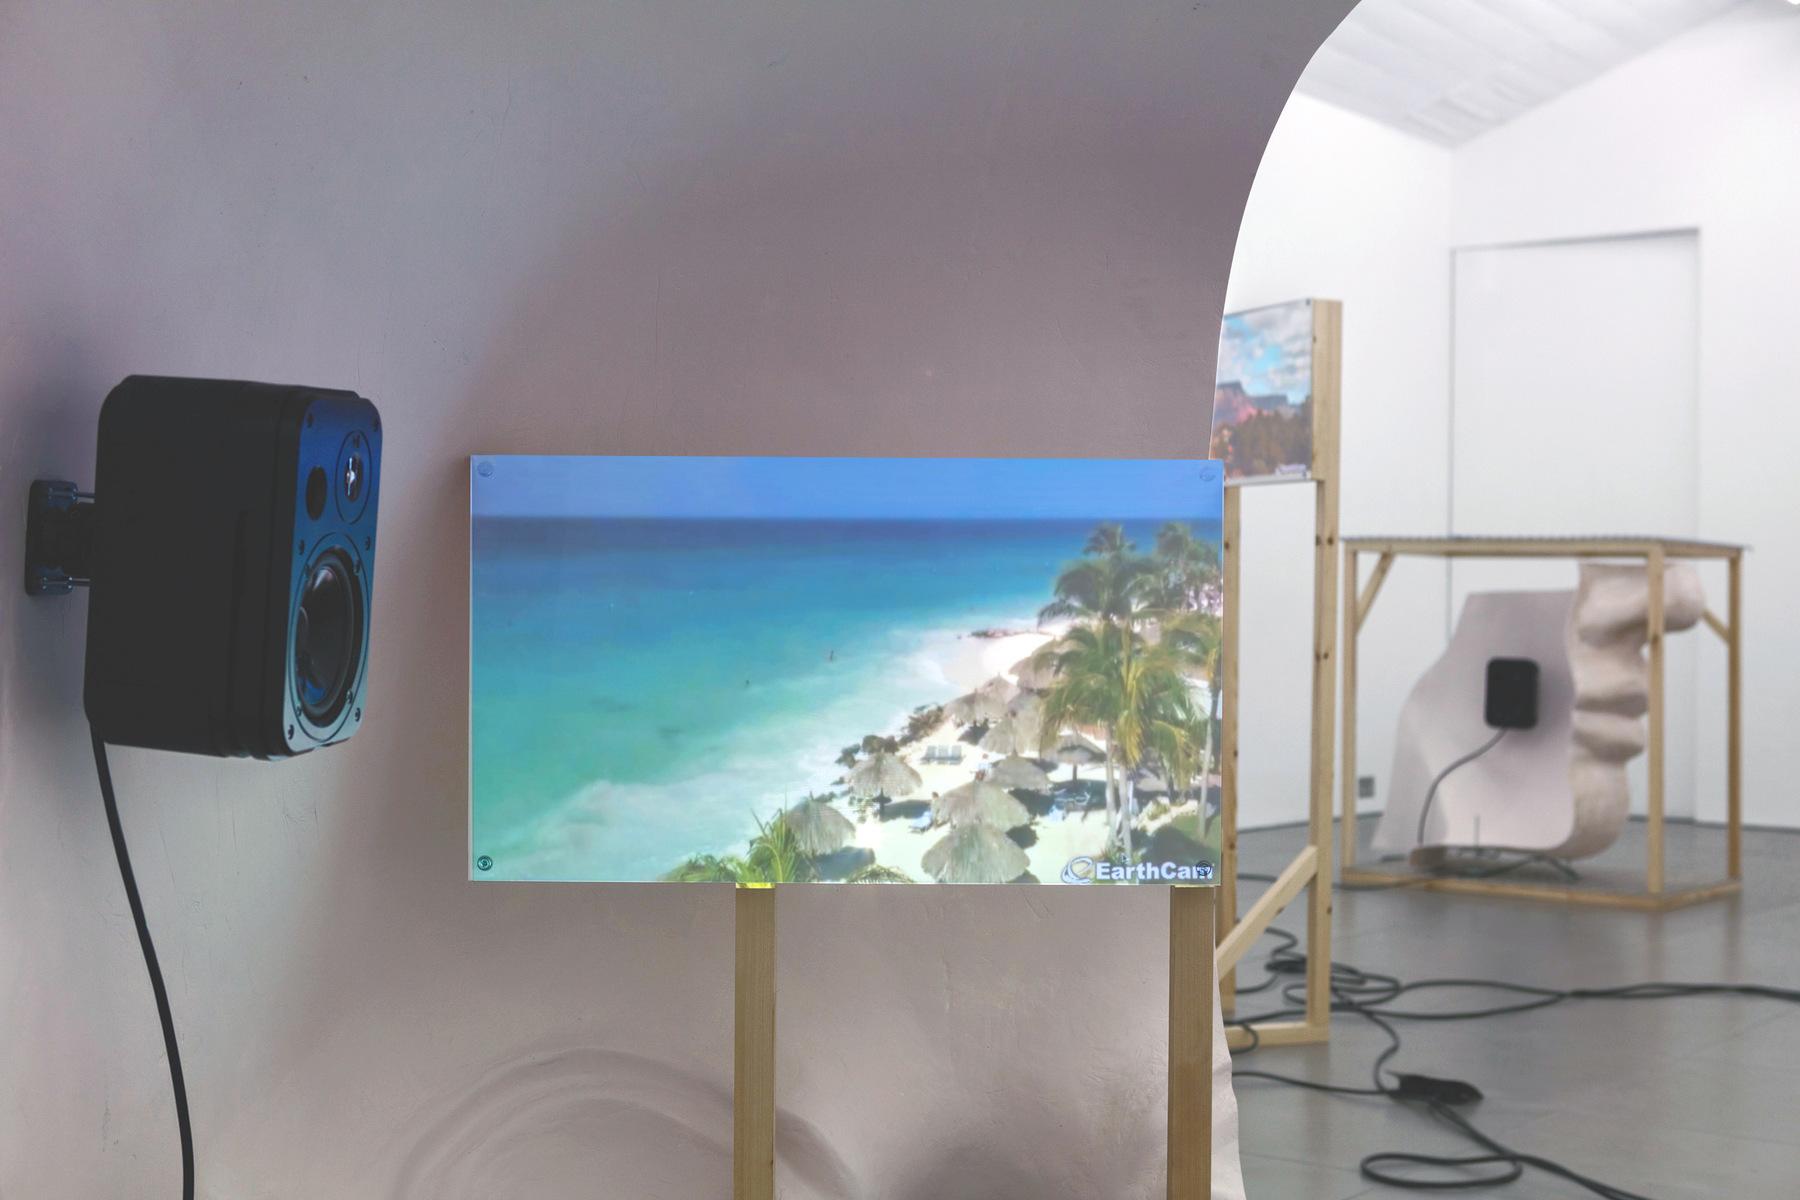 07. Anne de Vries, SUBMISSION 2015, wood, metal, fibreglass resin, audio, video